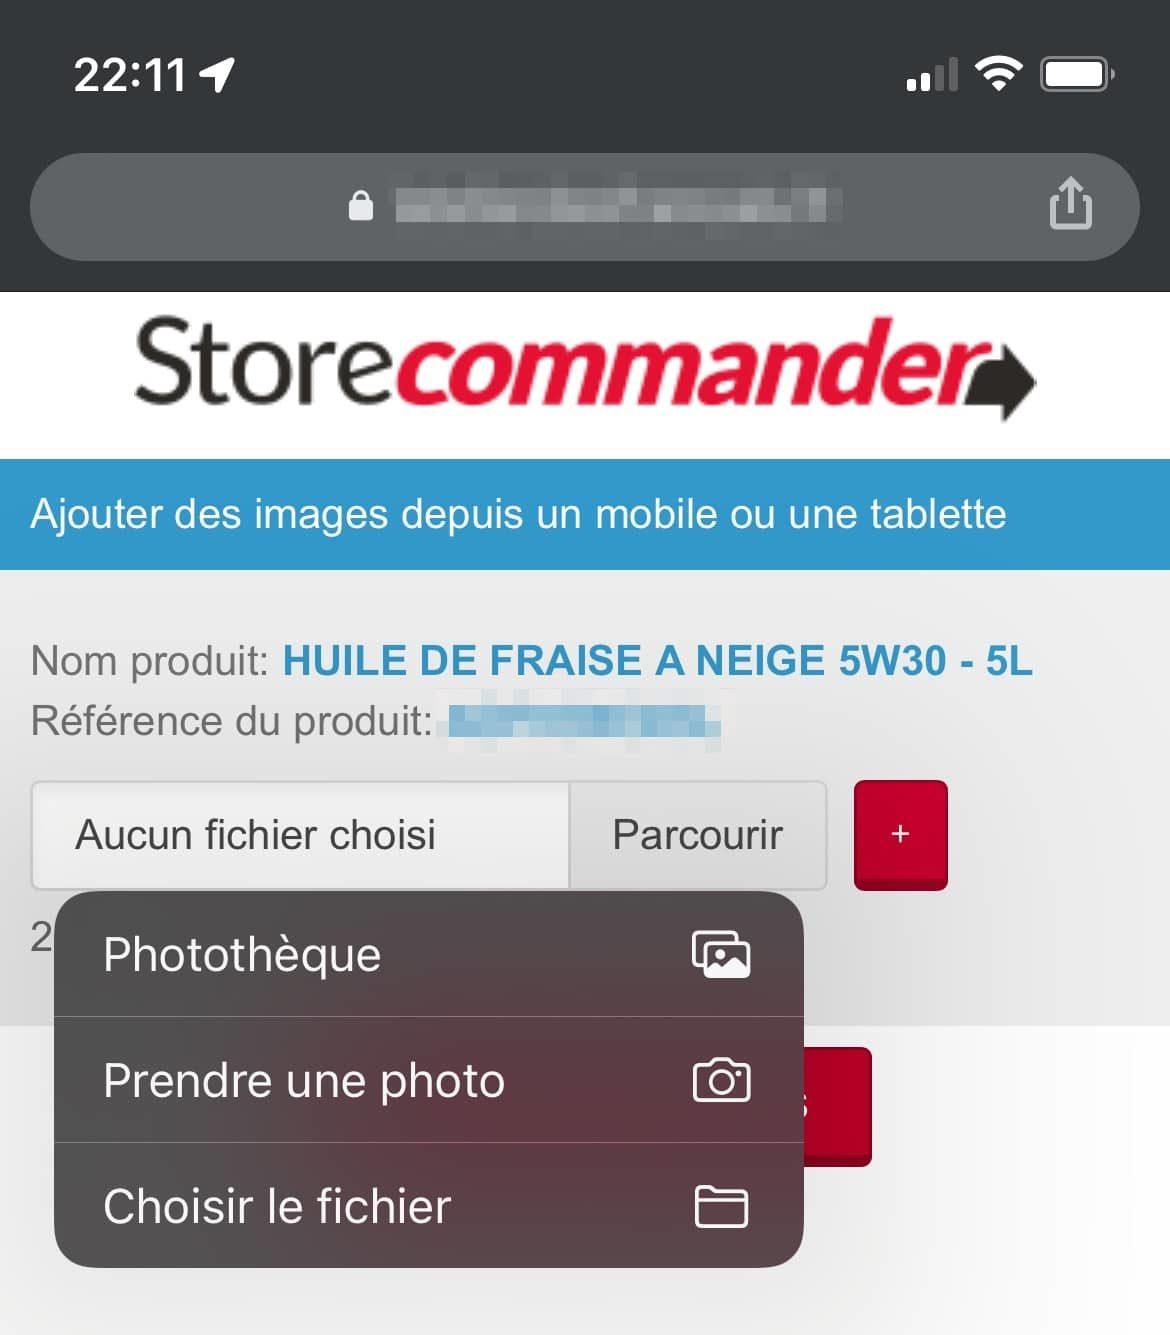 photos-produits-prestashop-store-commander-upload